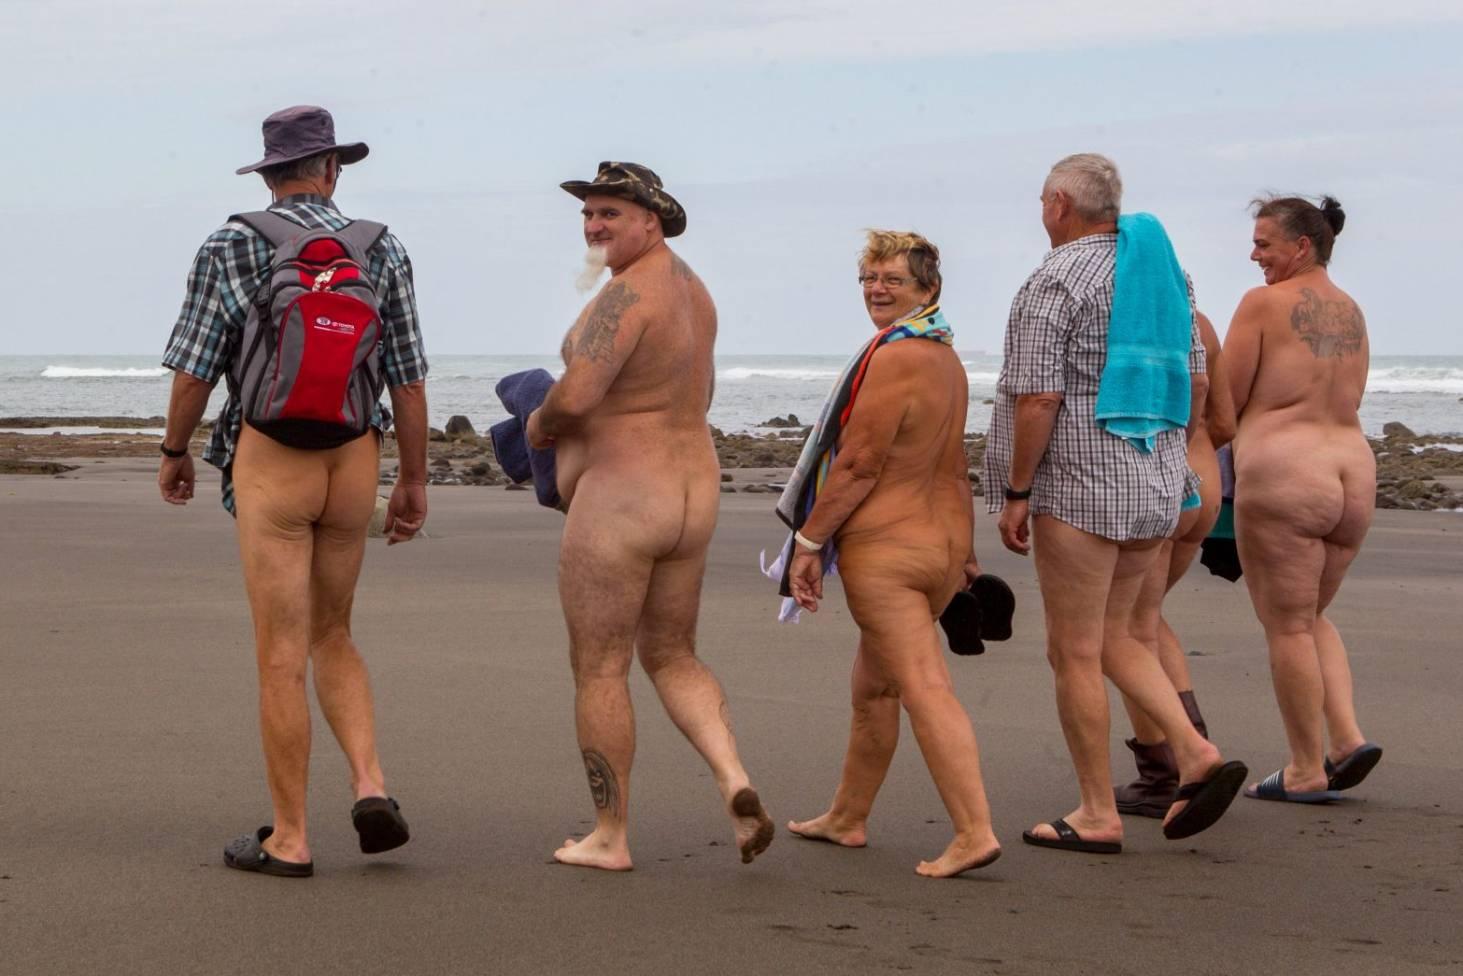 At beach nude Goldie Hawn,